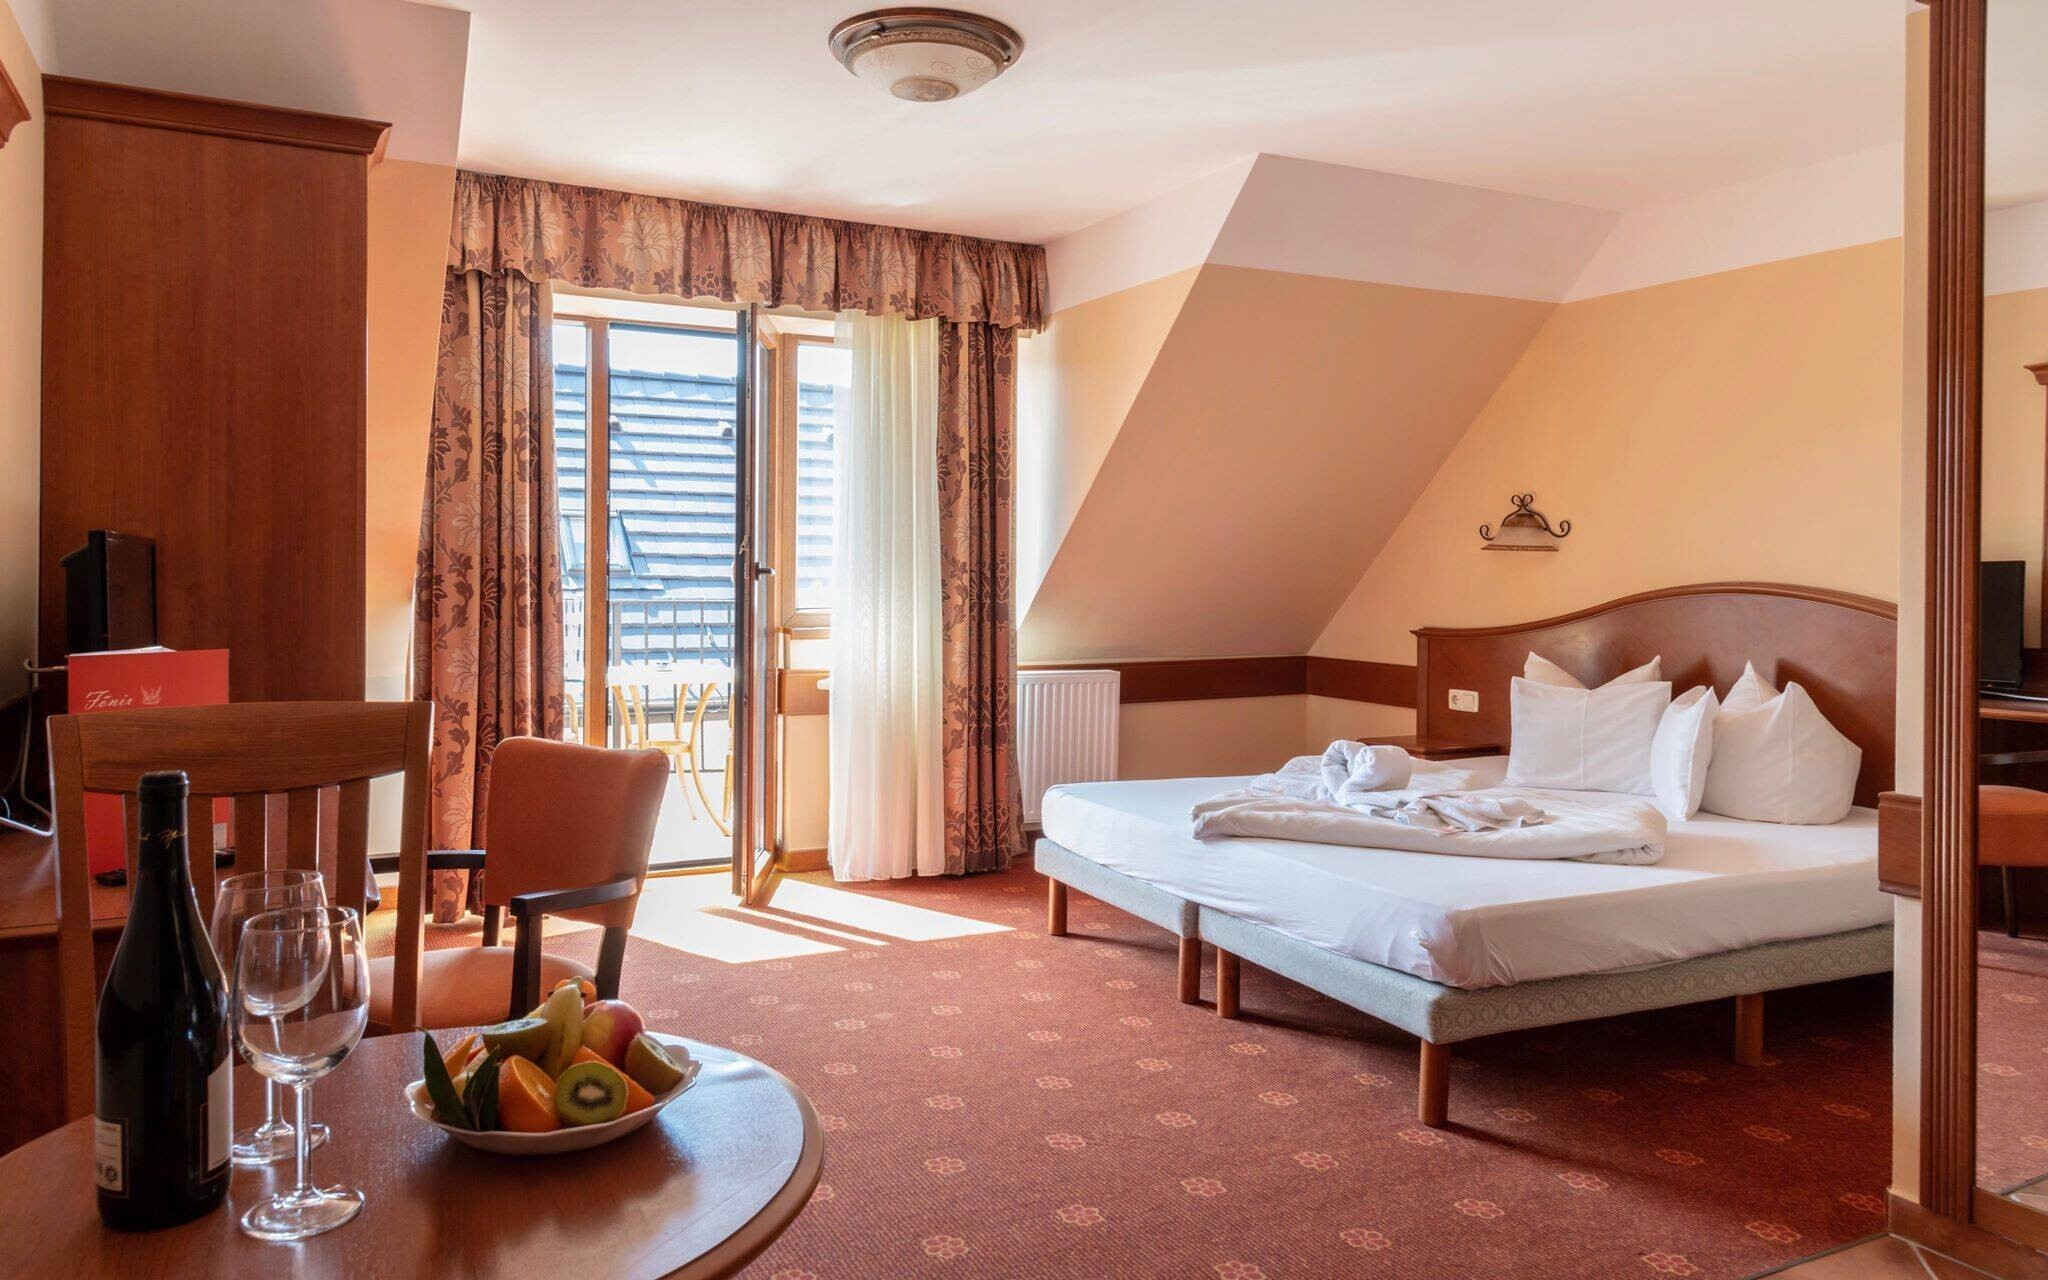 Pokoje ve Főnix Club Hotelu & Wellness *** jsou útulné